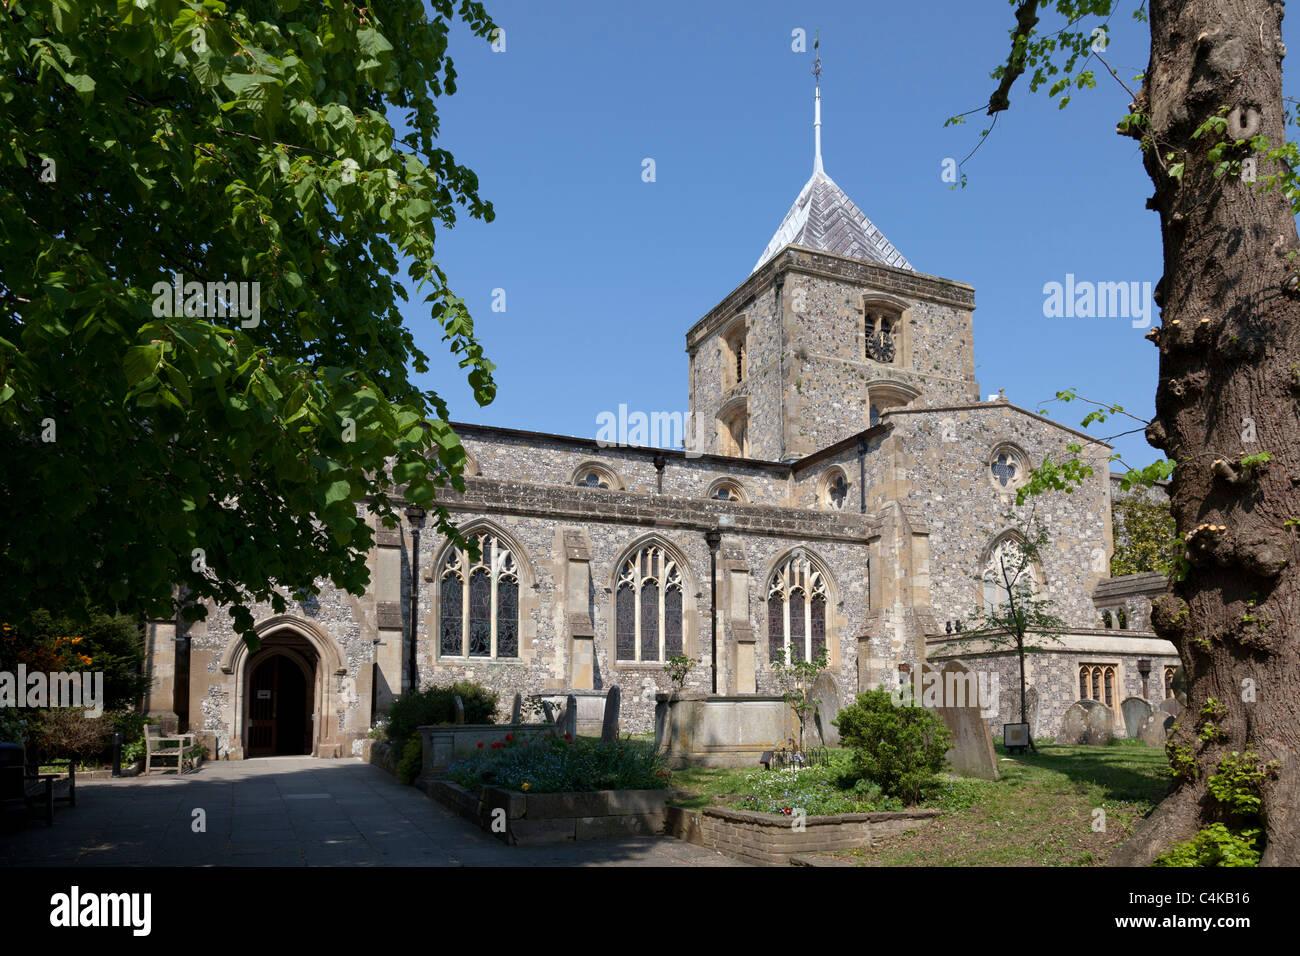 Parish and Priory Church of Saint Nicholas, Arundel - Stock Image